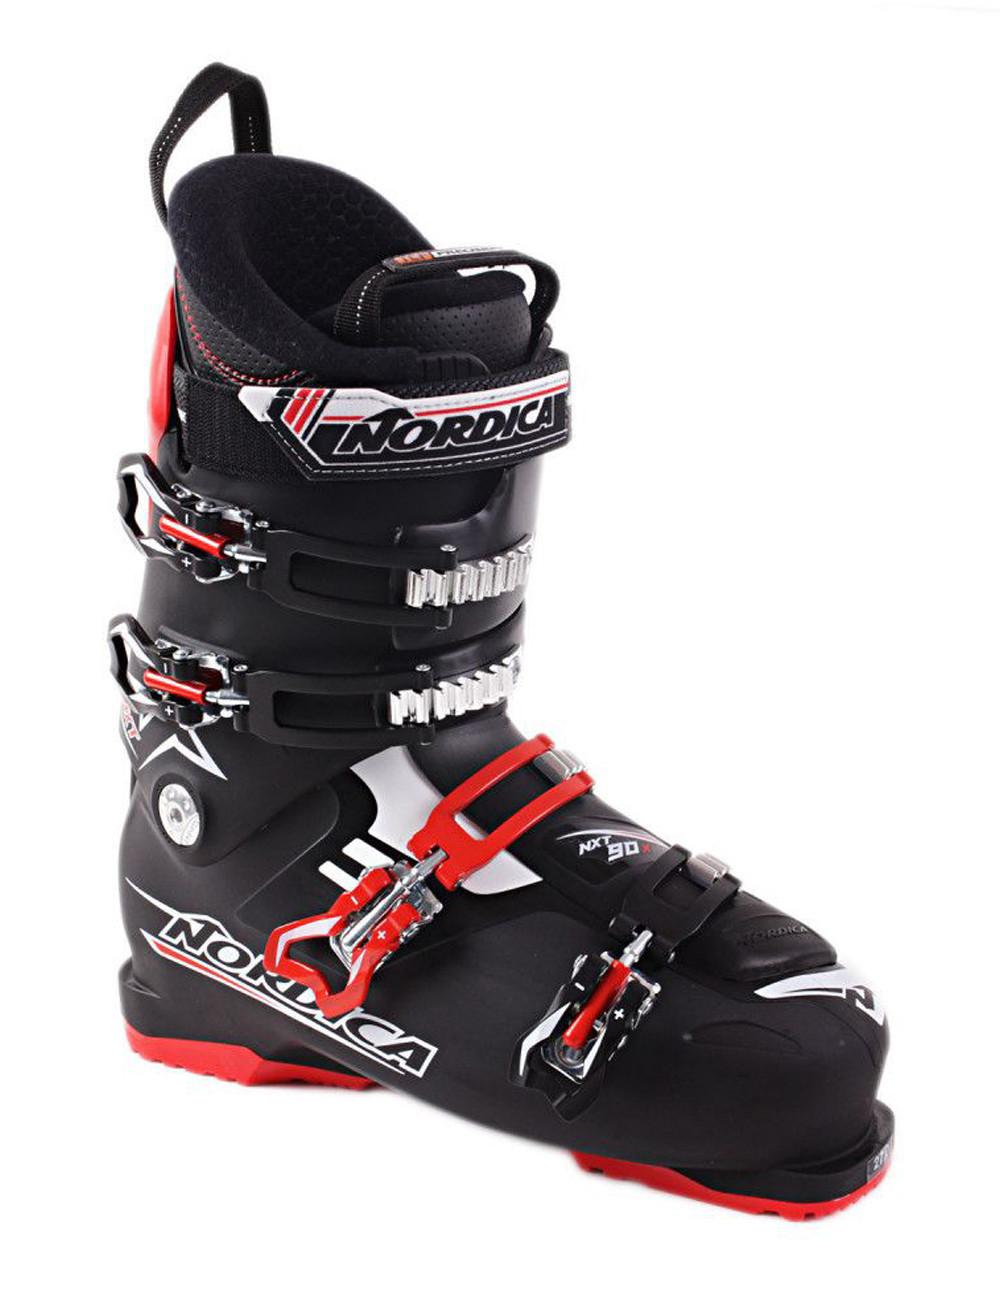 Buty narciarskie Nordica NXT 90